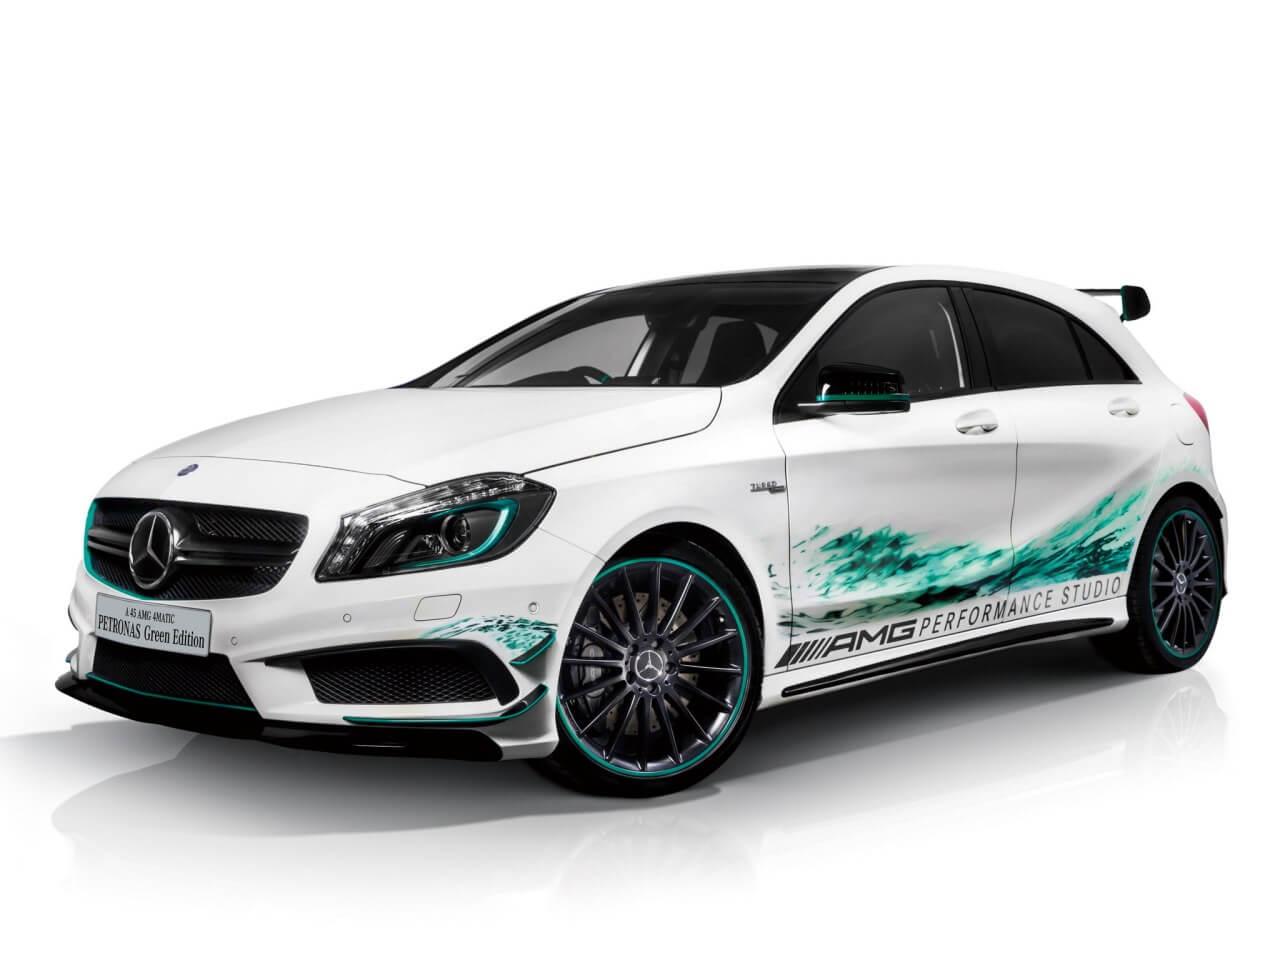 A 45 AMG Petronas Green Edition